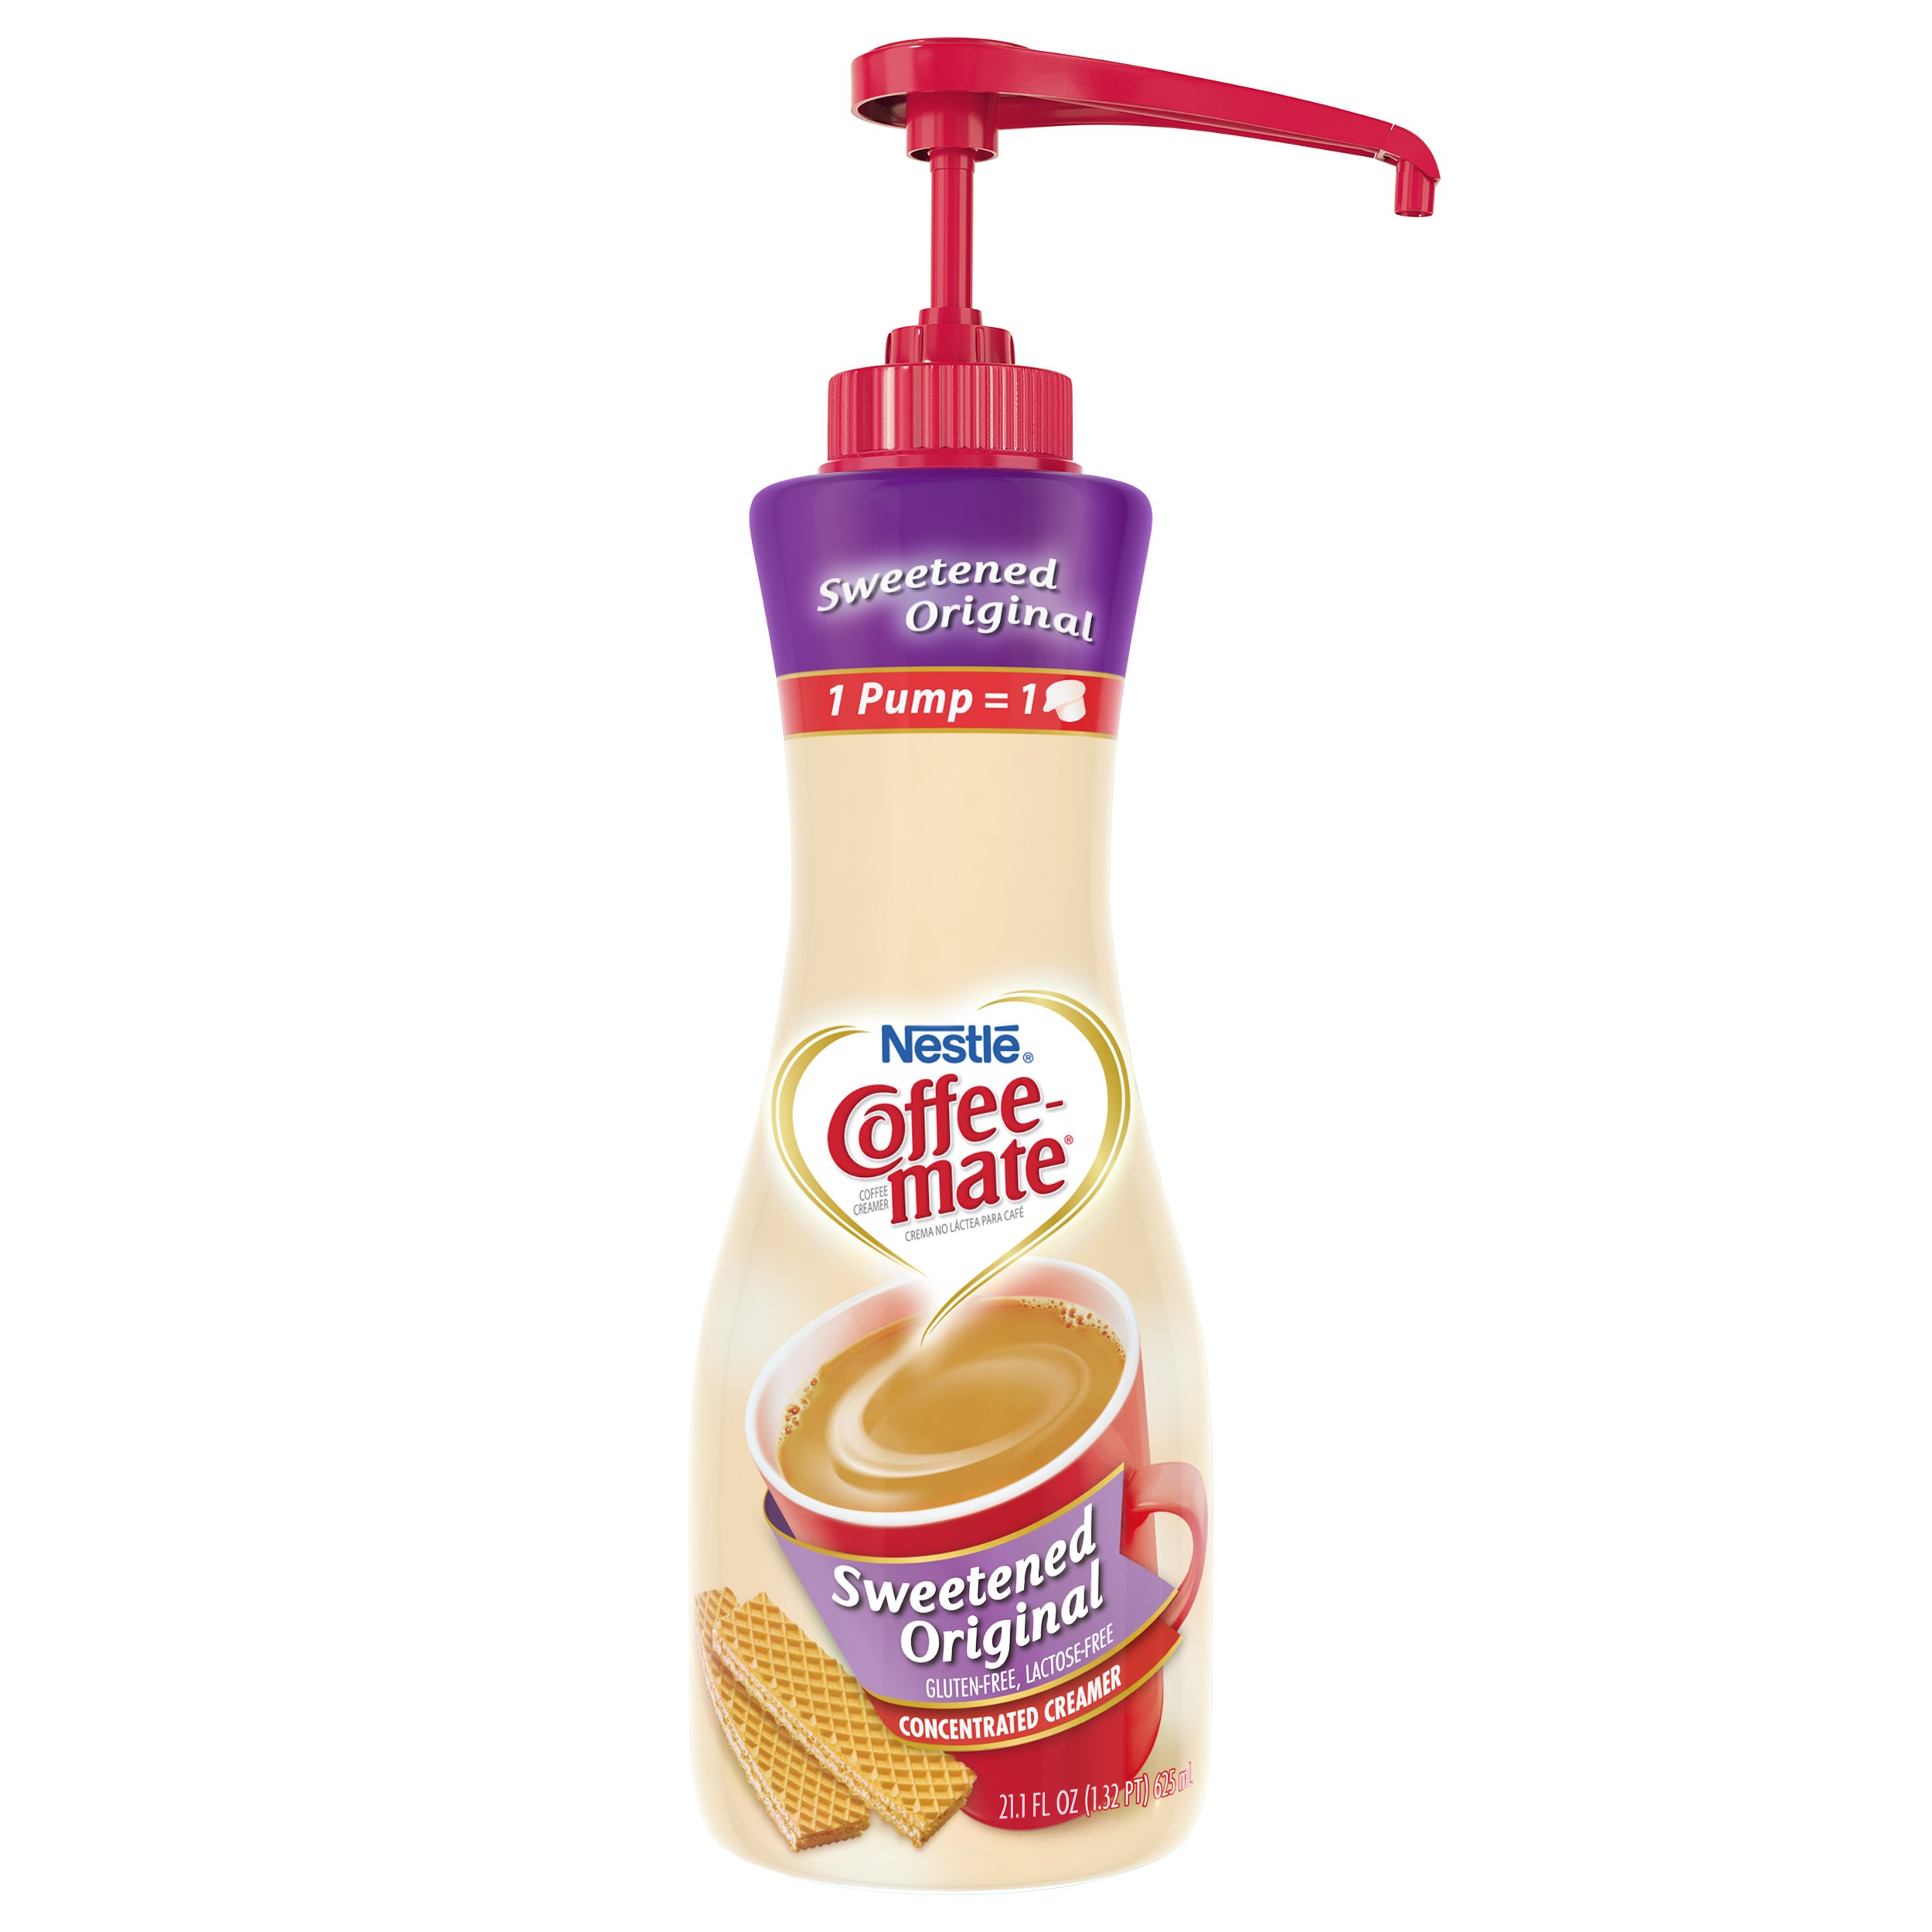 Nestle Coffee-mate Coffee Creamer, Sweetened Original, 21.1 oz liquid pump bottle by Nestle Coffee Mate (Image #1)